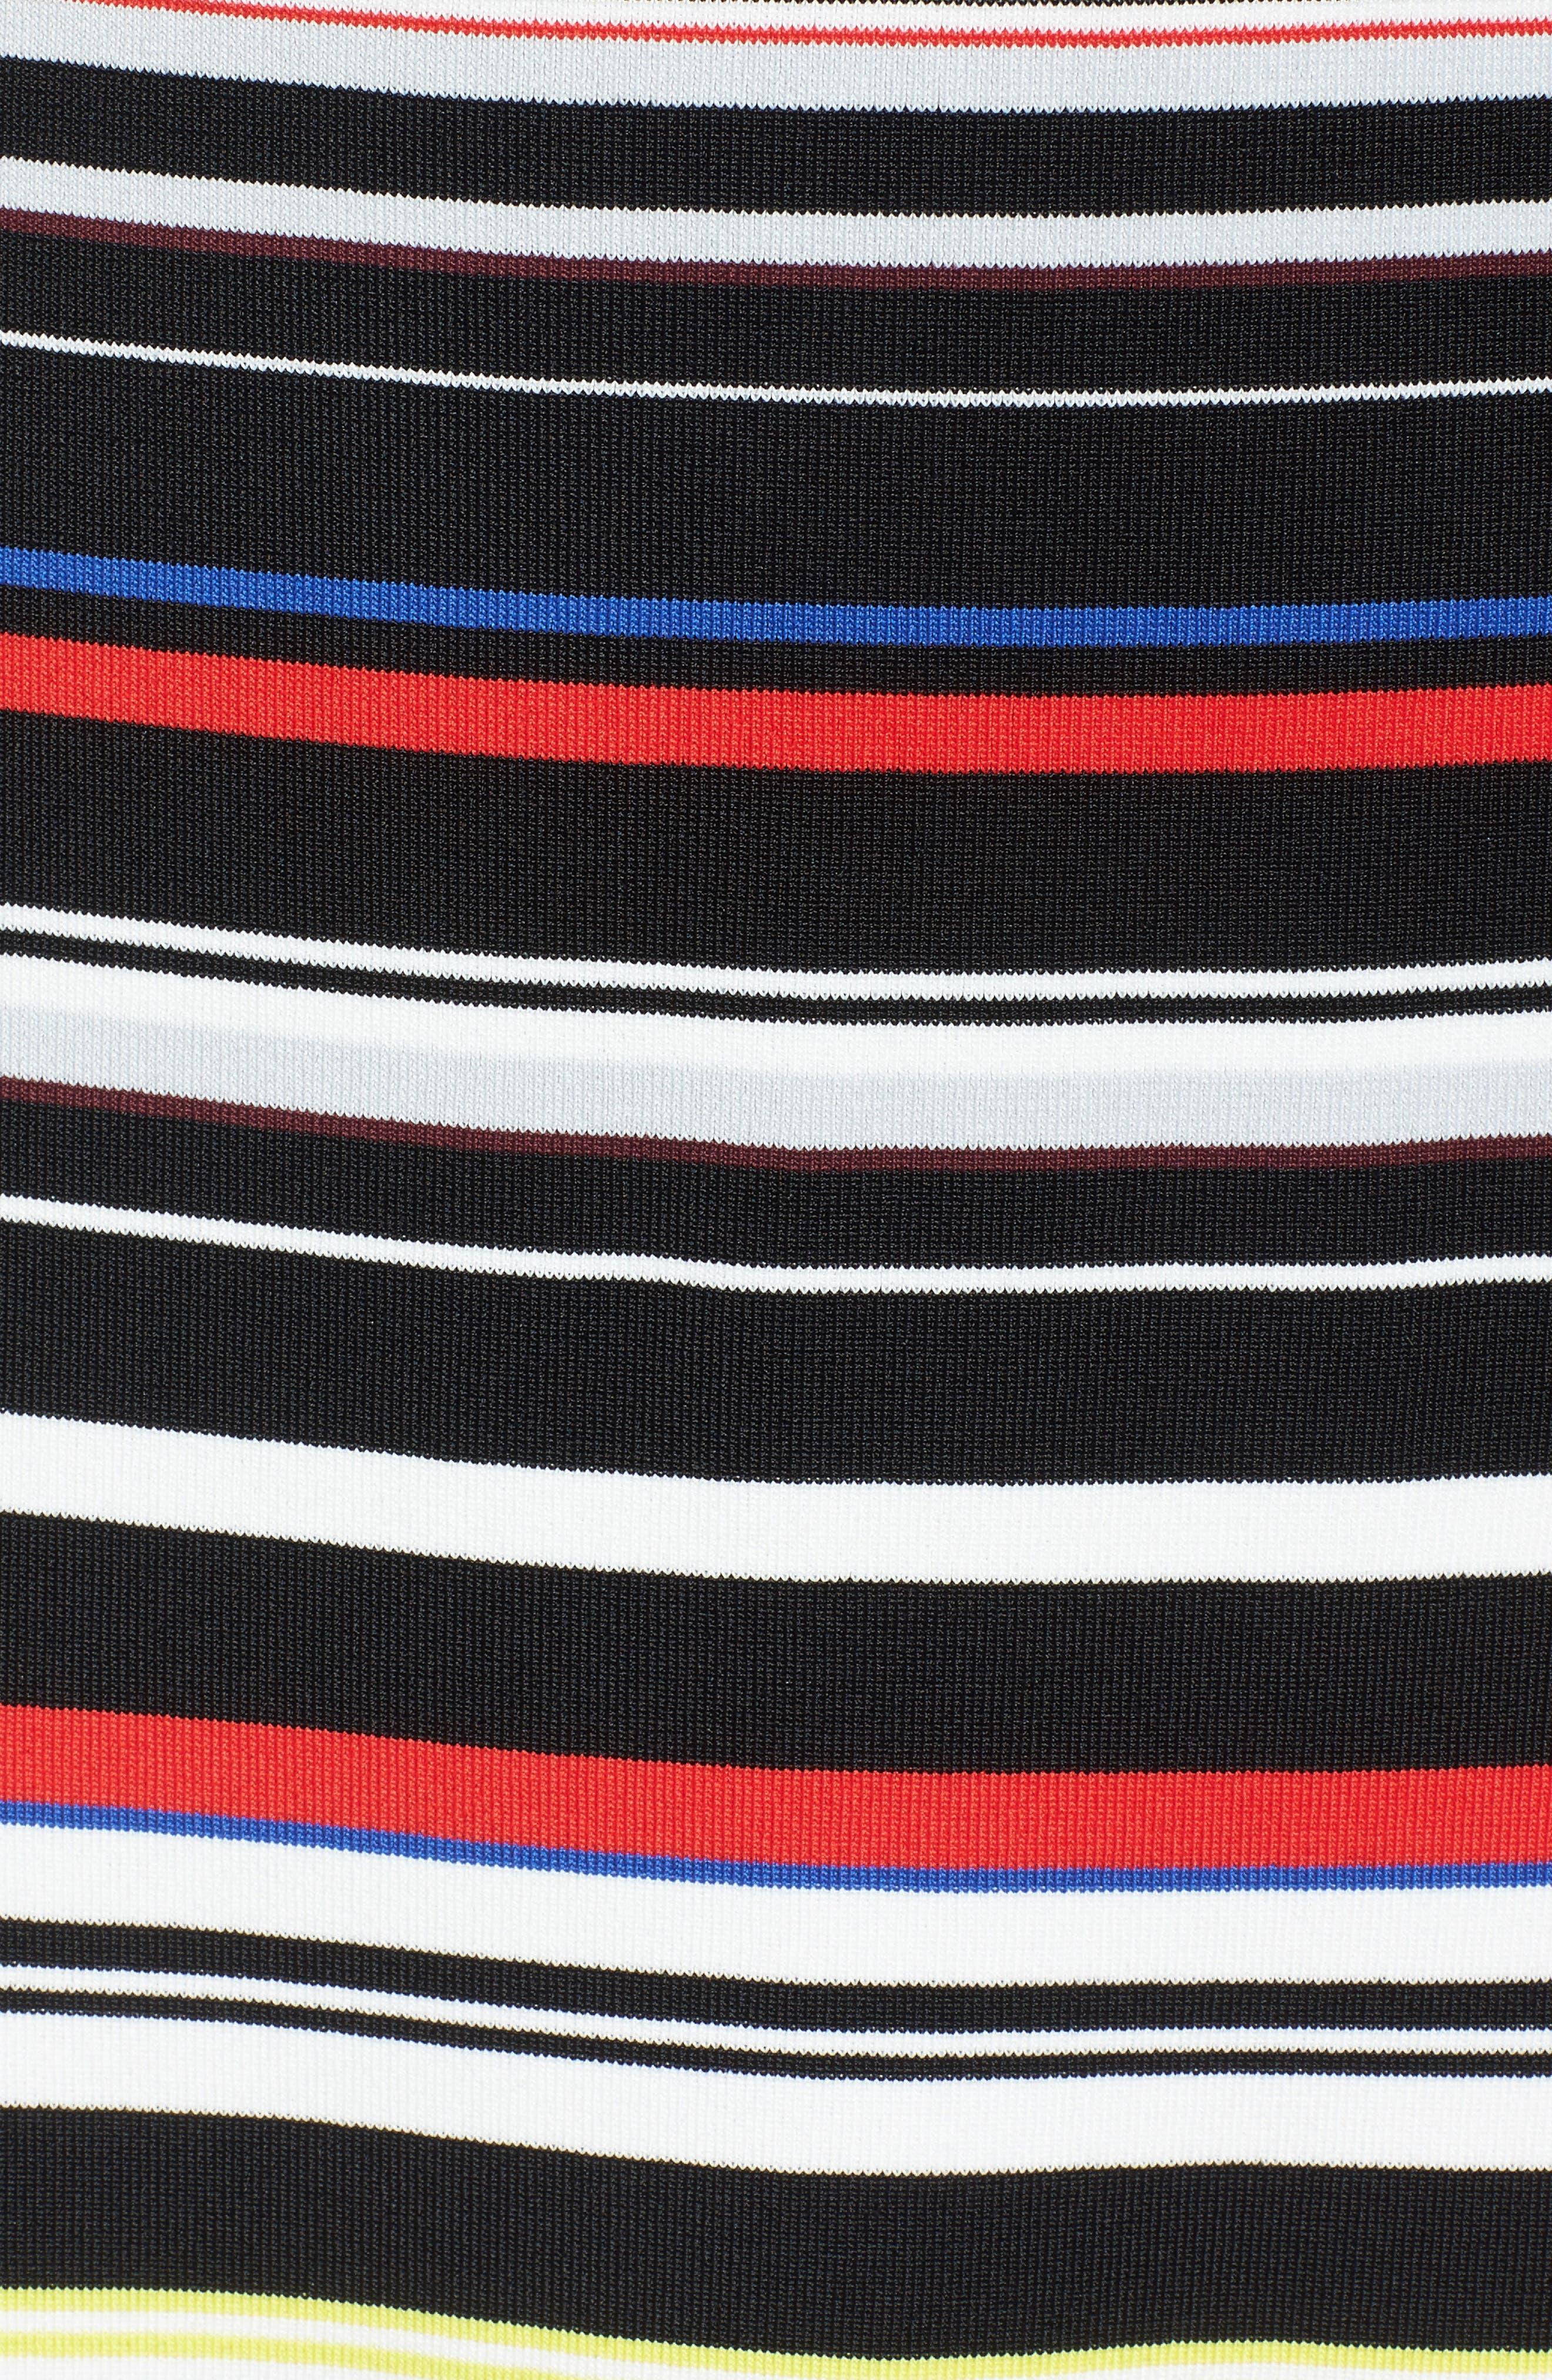 Sleeveless Mock Neck Knit Dress,                             Alternate thumbnail 6, color,                             Black- Red Stripe